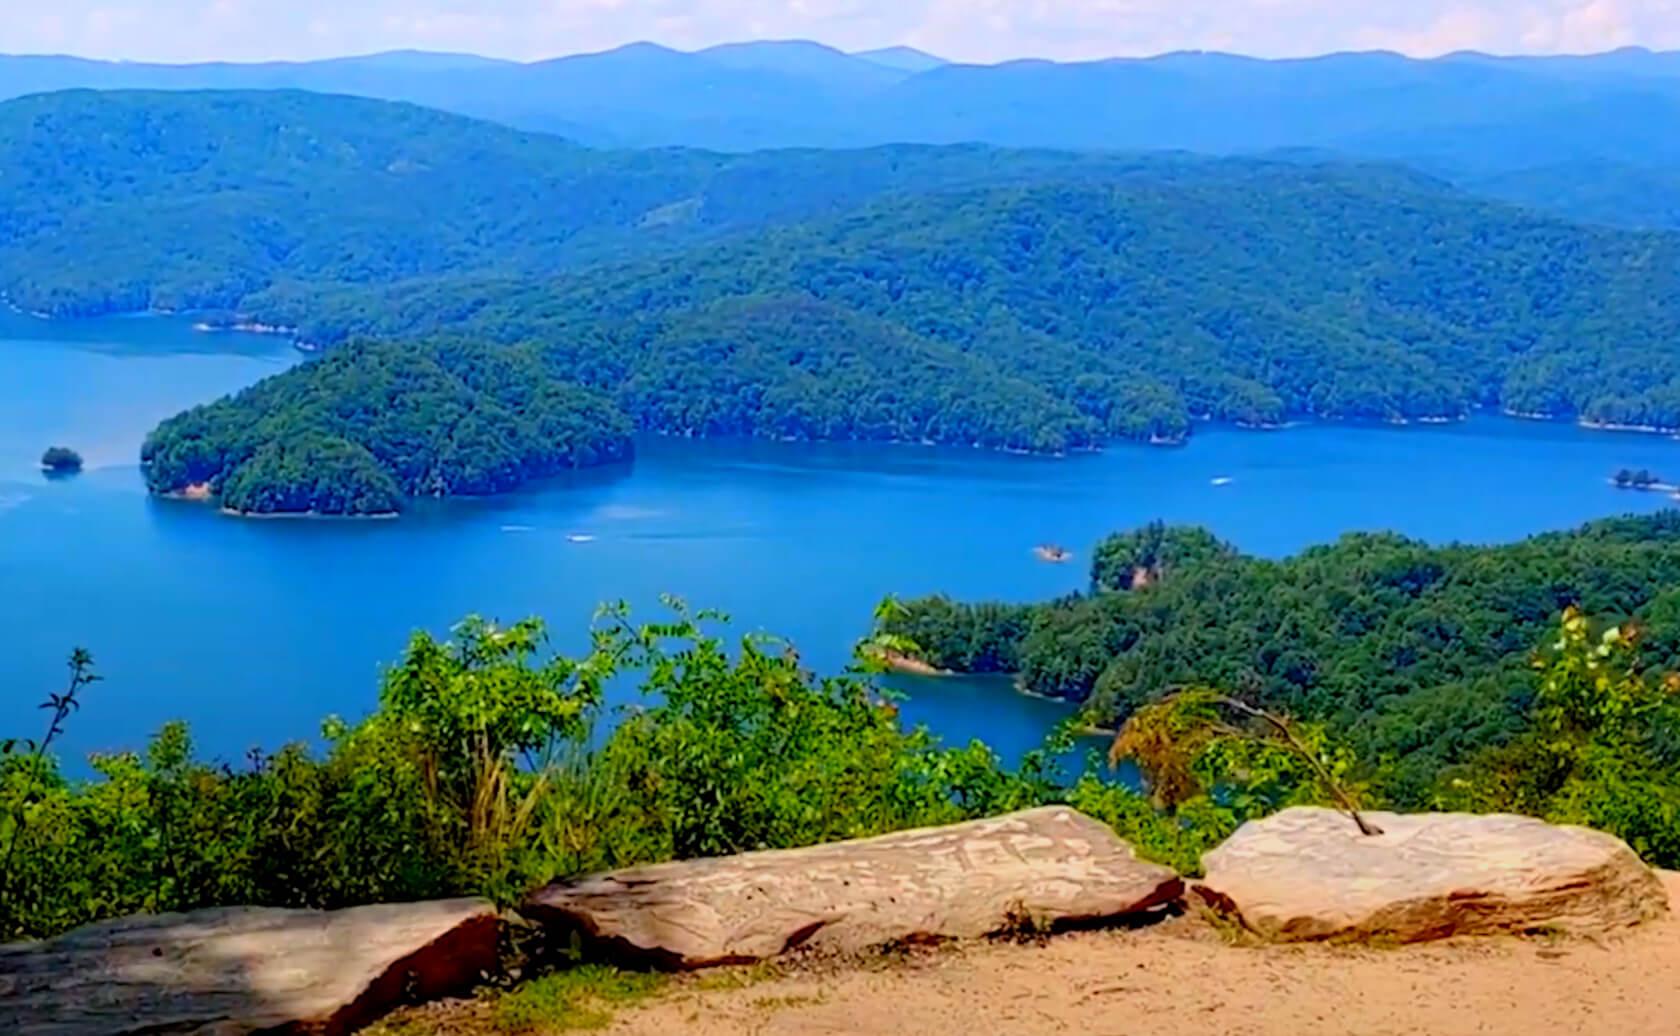 Jocassee-Lake-Fishing-Guide-Report-South-Carolina-02